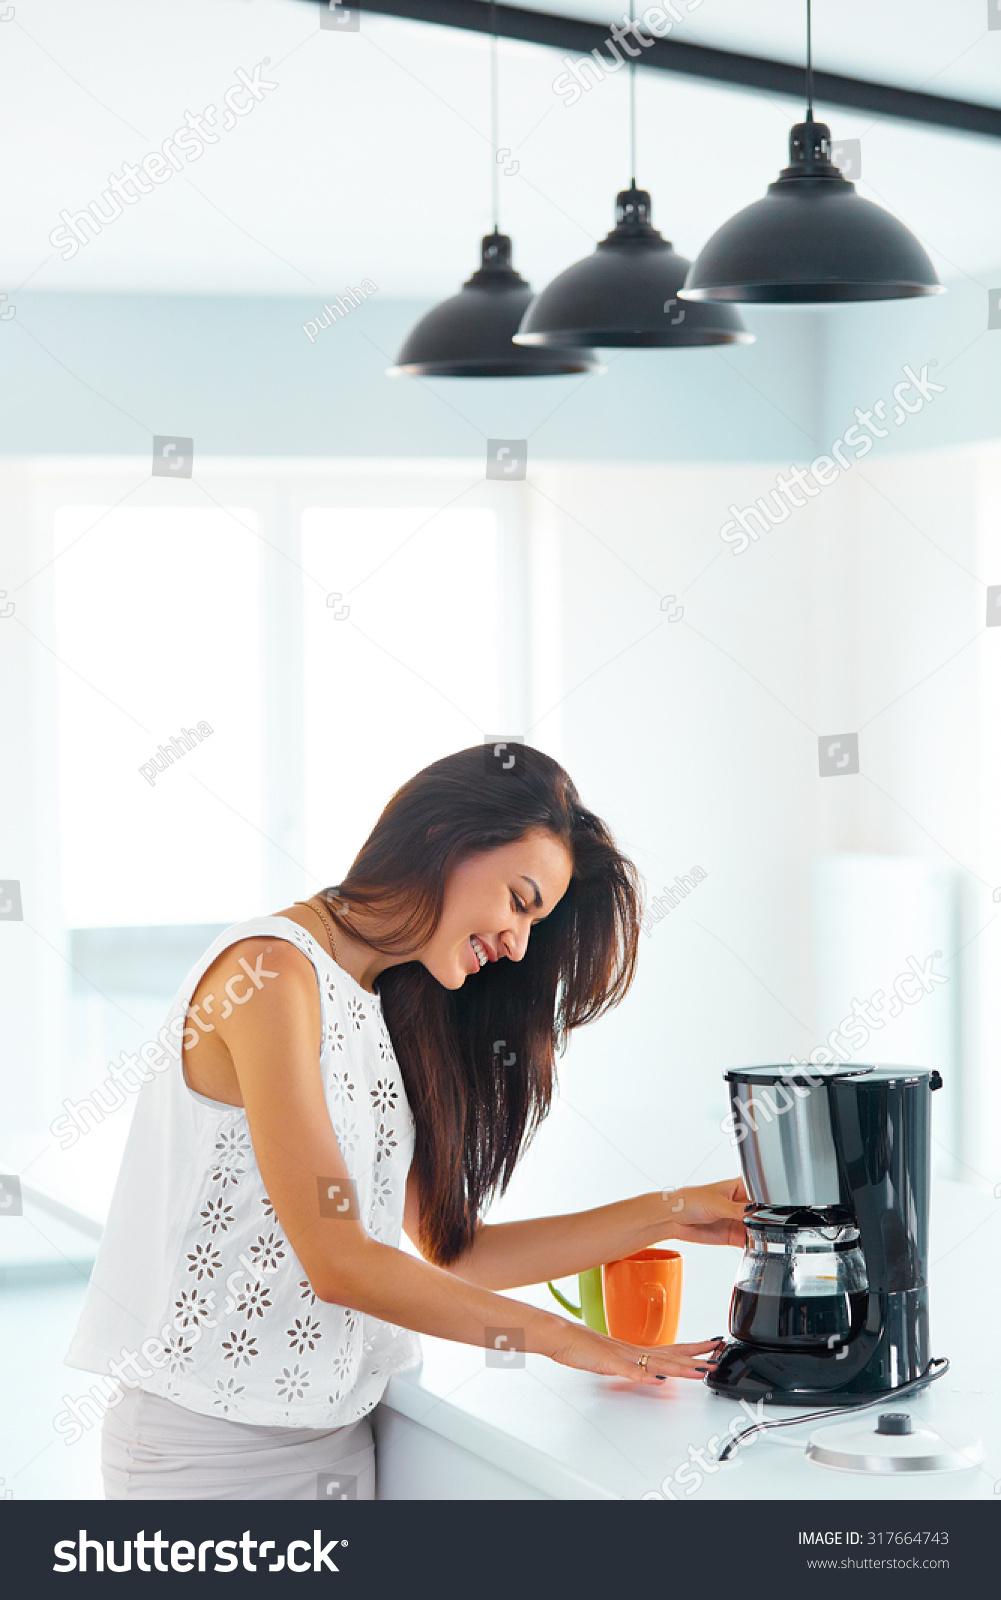 Beautiful Smiling Girl Making Coffee Breakfast Stock Photo (Download ...